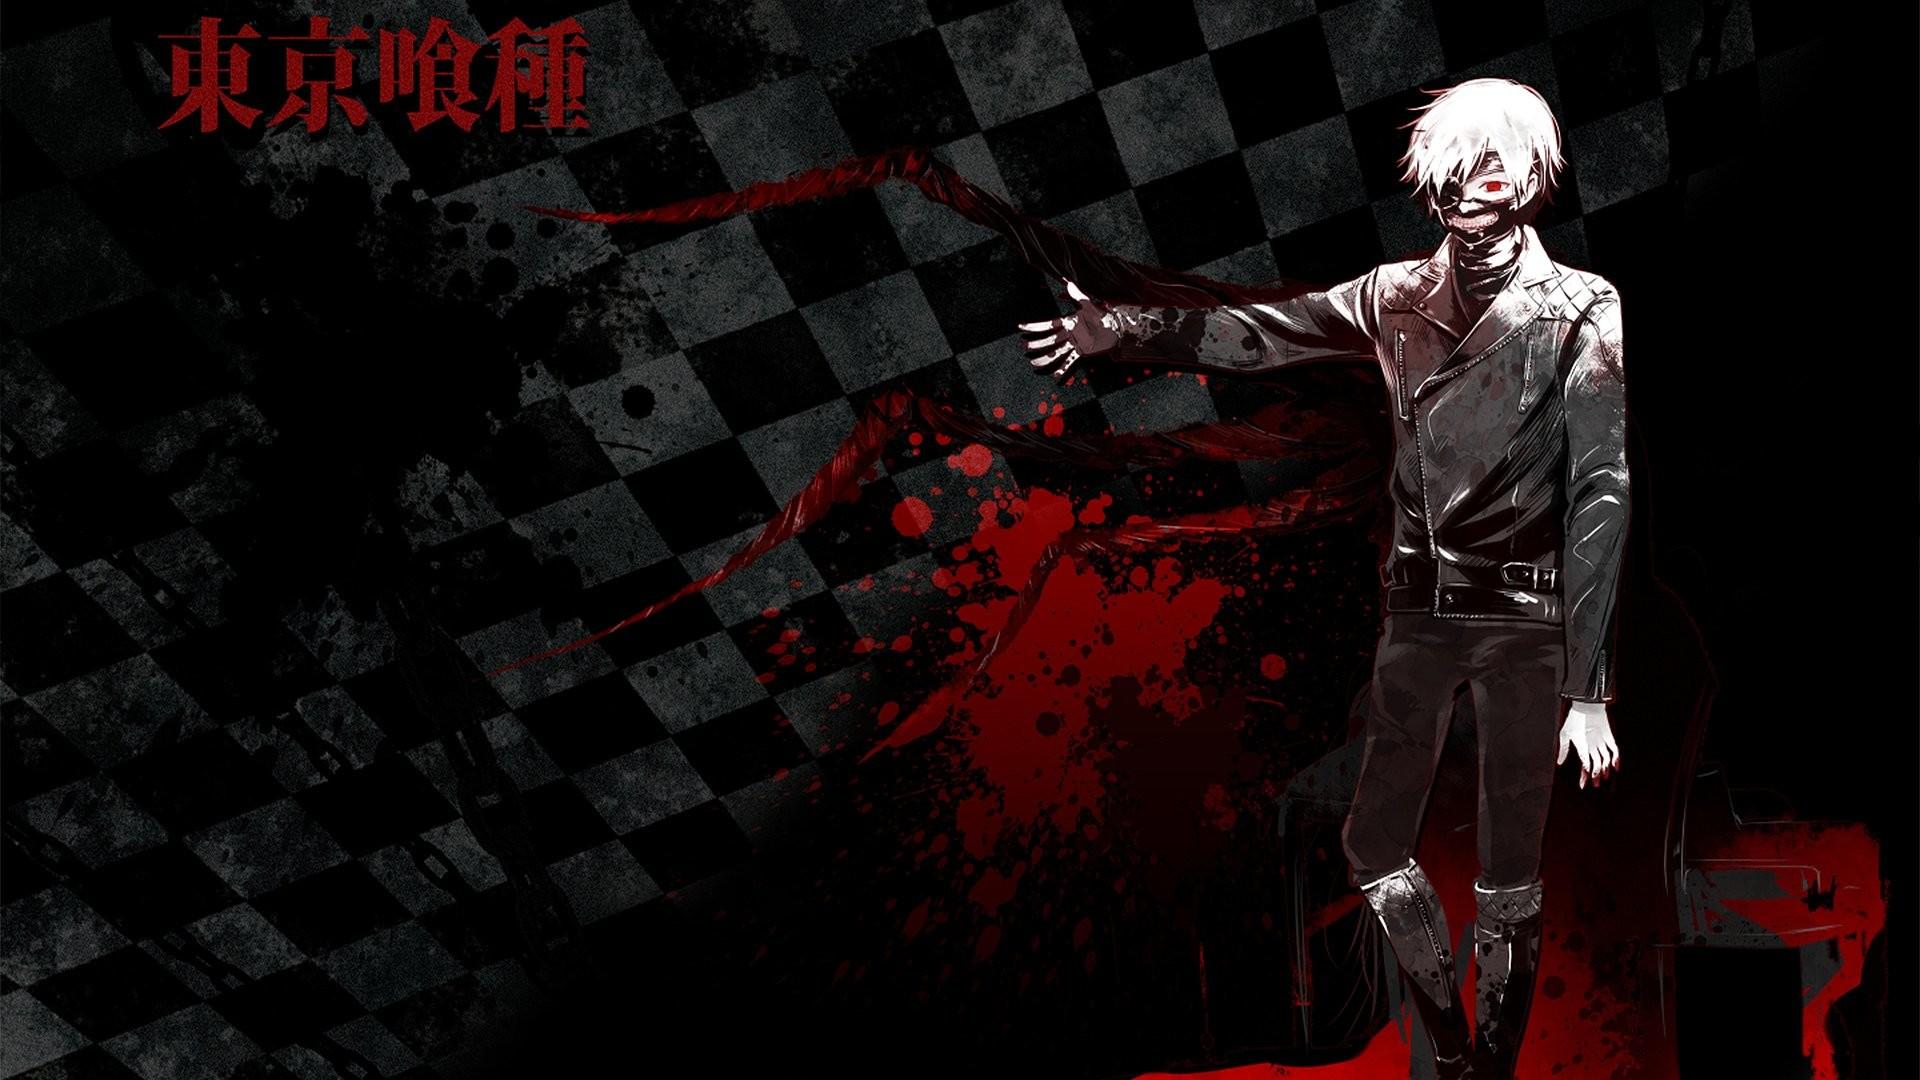 Tokyo Ghoul Wallpaper Hd 74 Images